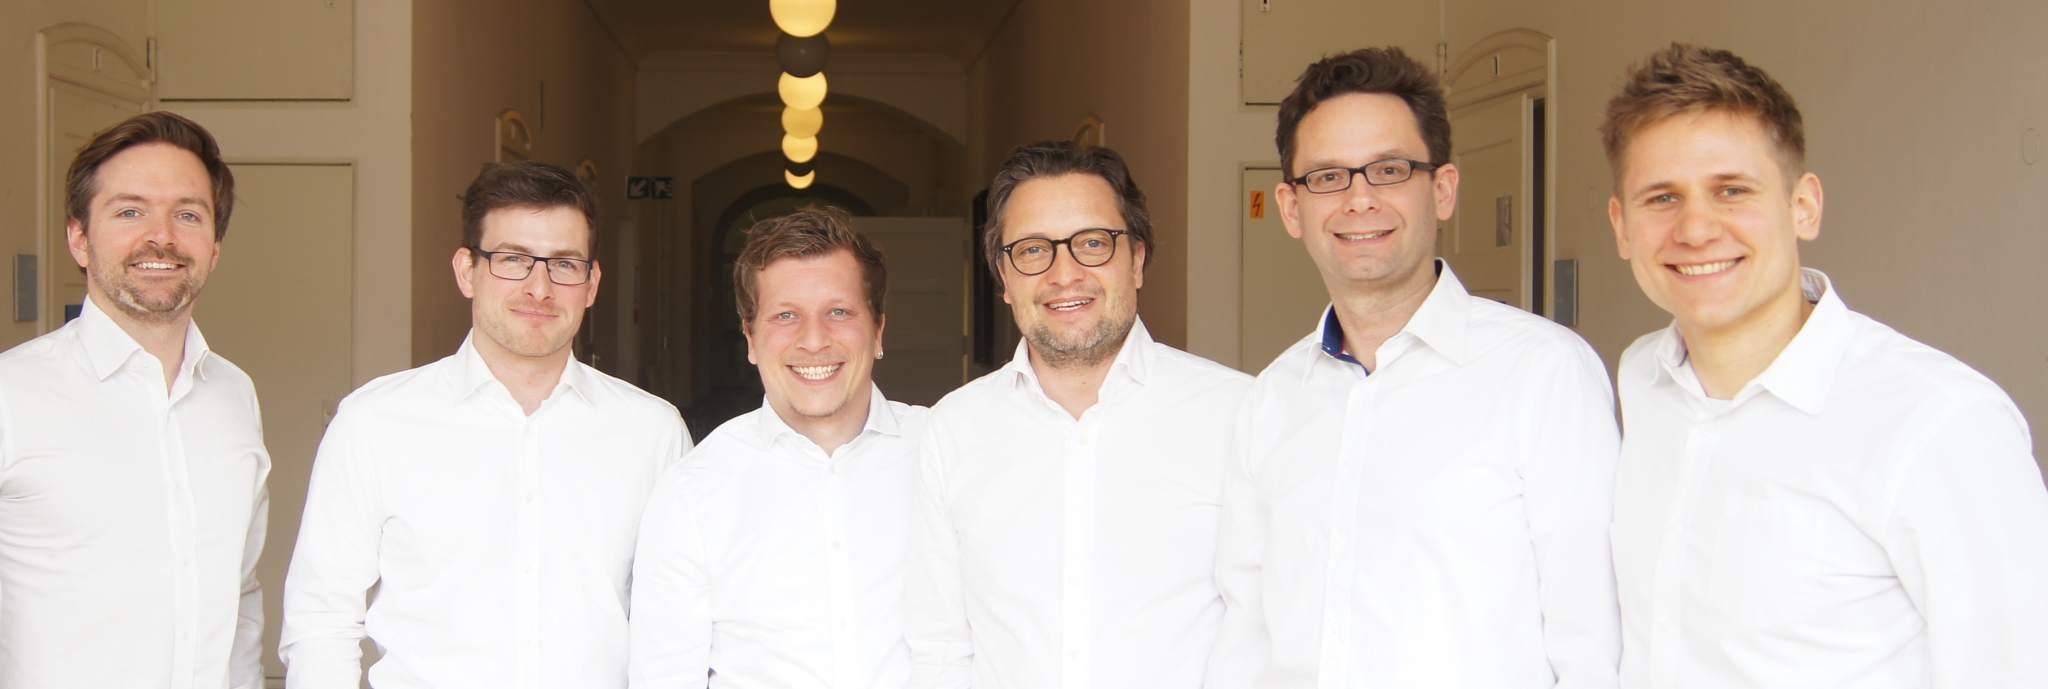 The Mecuris team founders, Manuel Opitz far right. Photo via Mecuris.